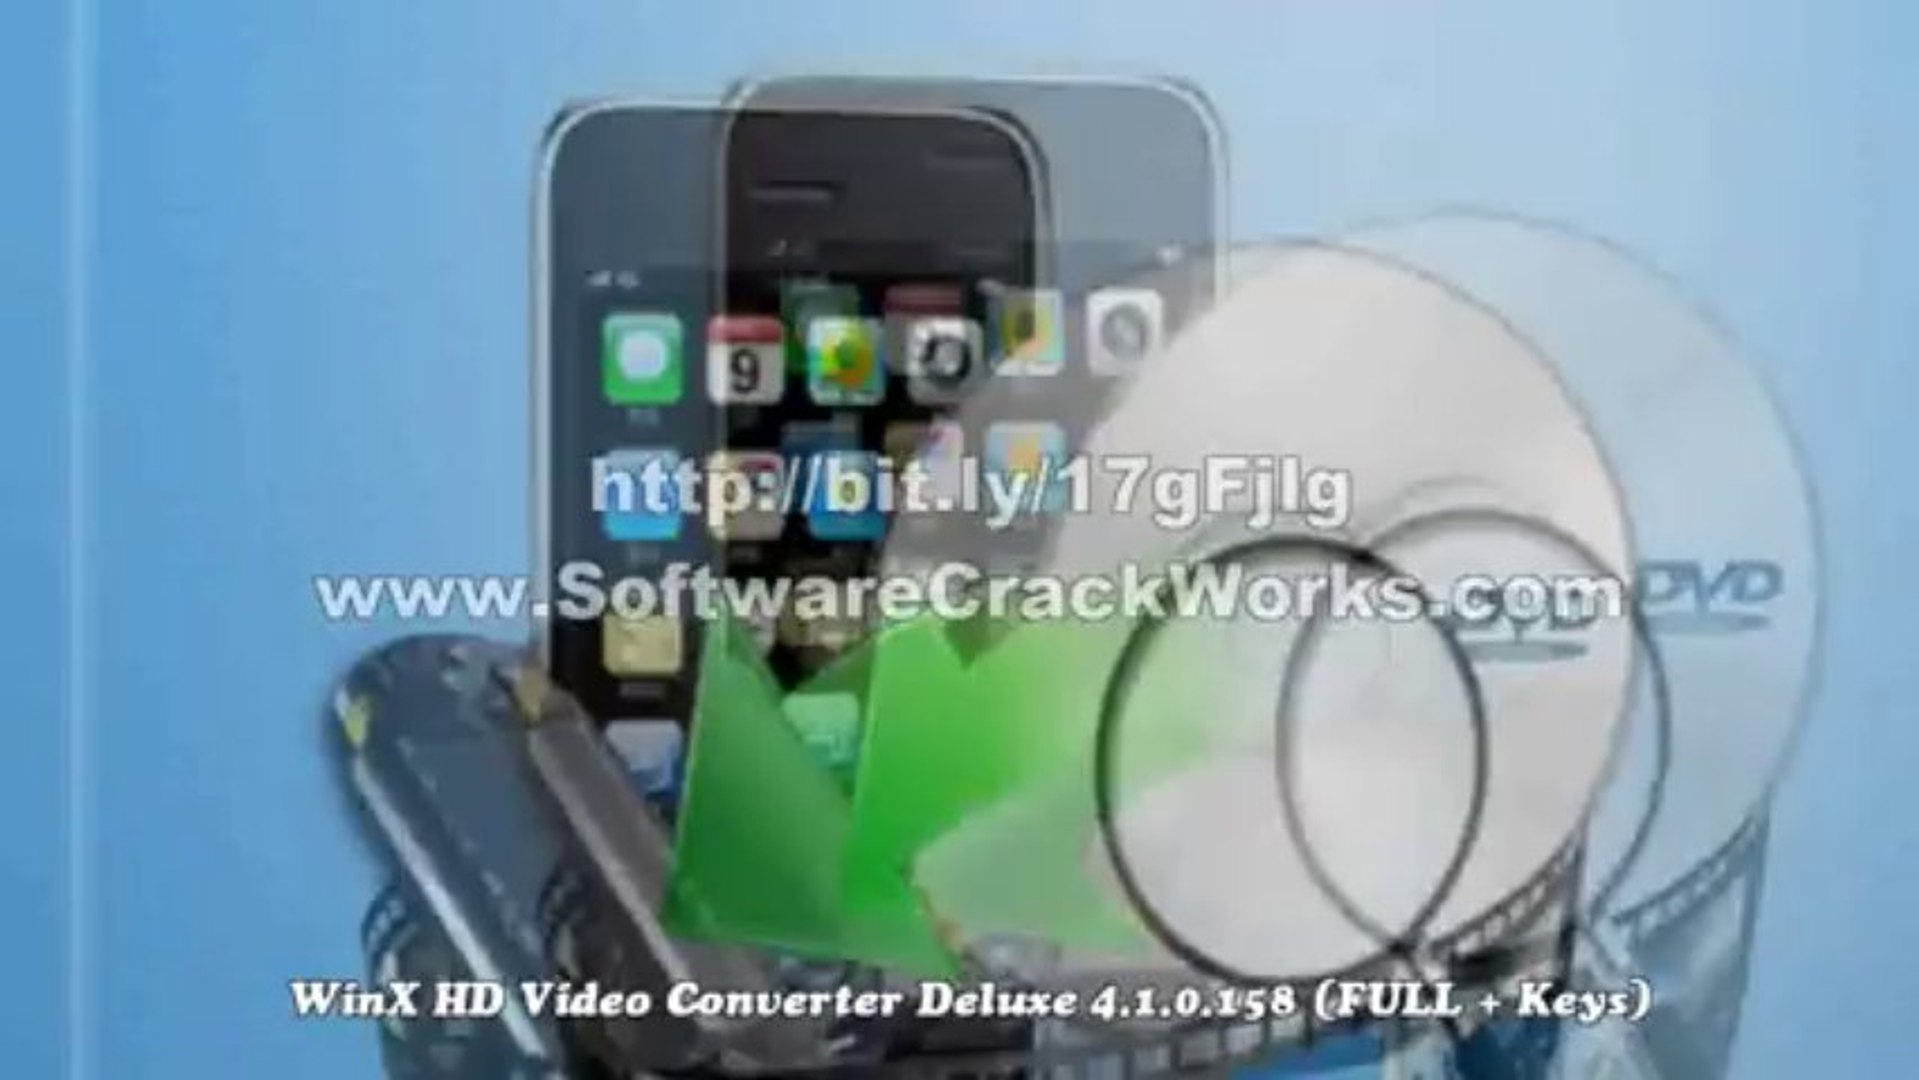 WinX HD Video Converter Deluxe 4 1 0 158 (FULL + Keys)